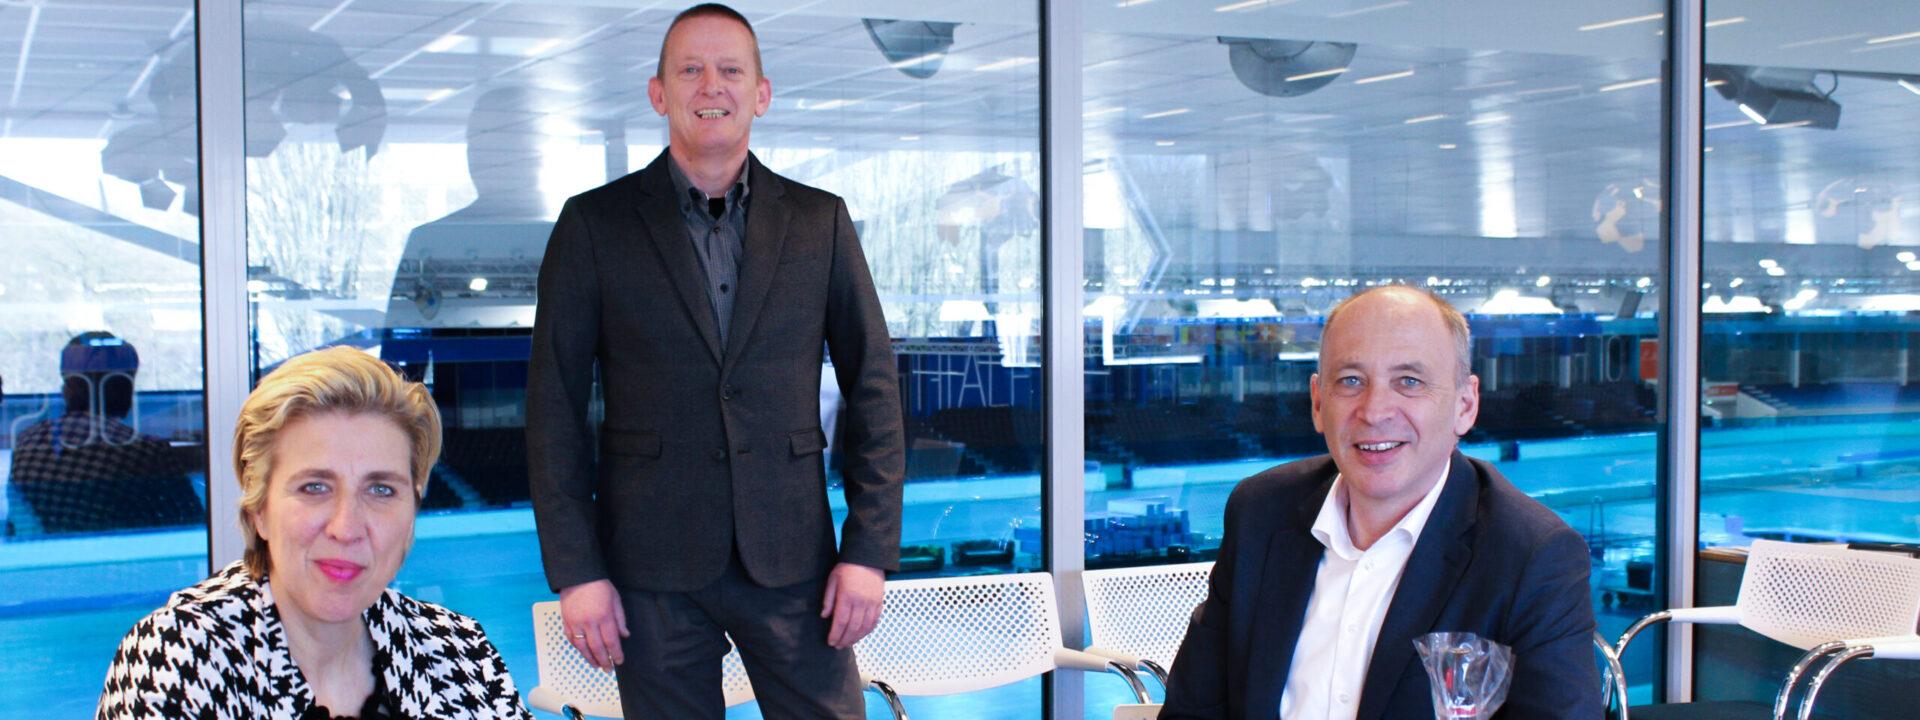 Thialf en EW Facility Services verlengen succesvolle samenwerking